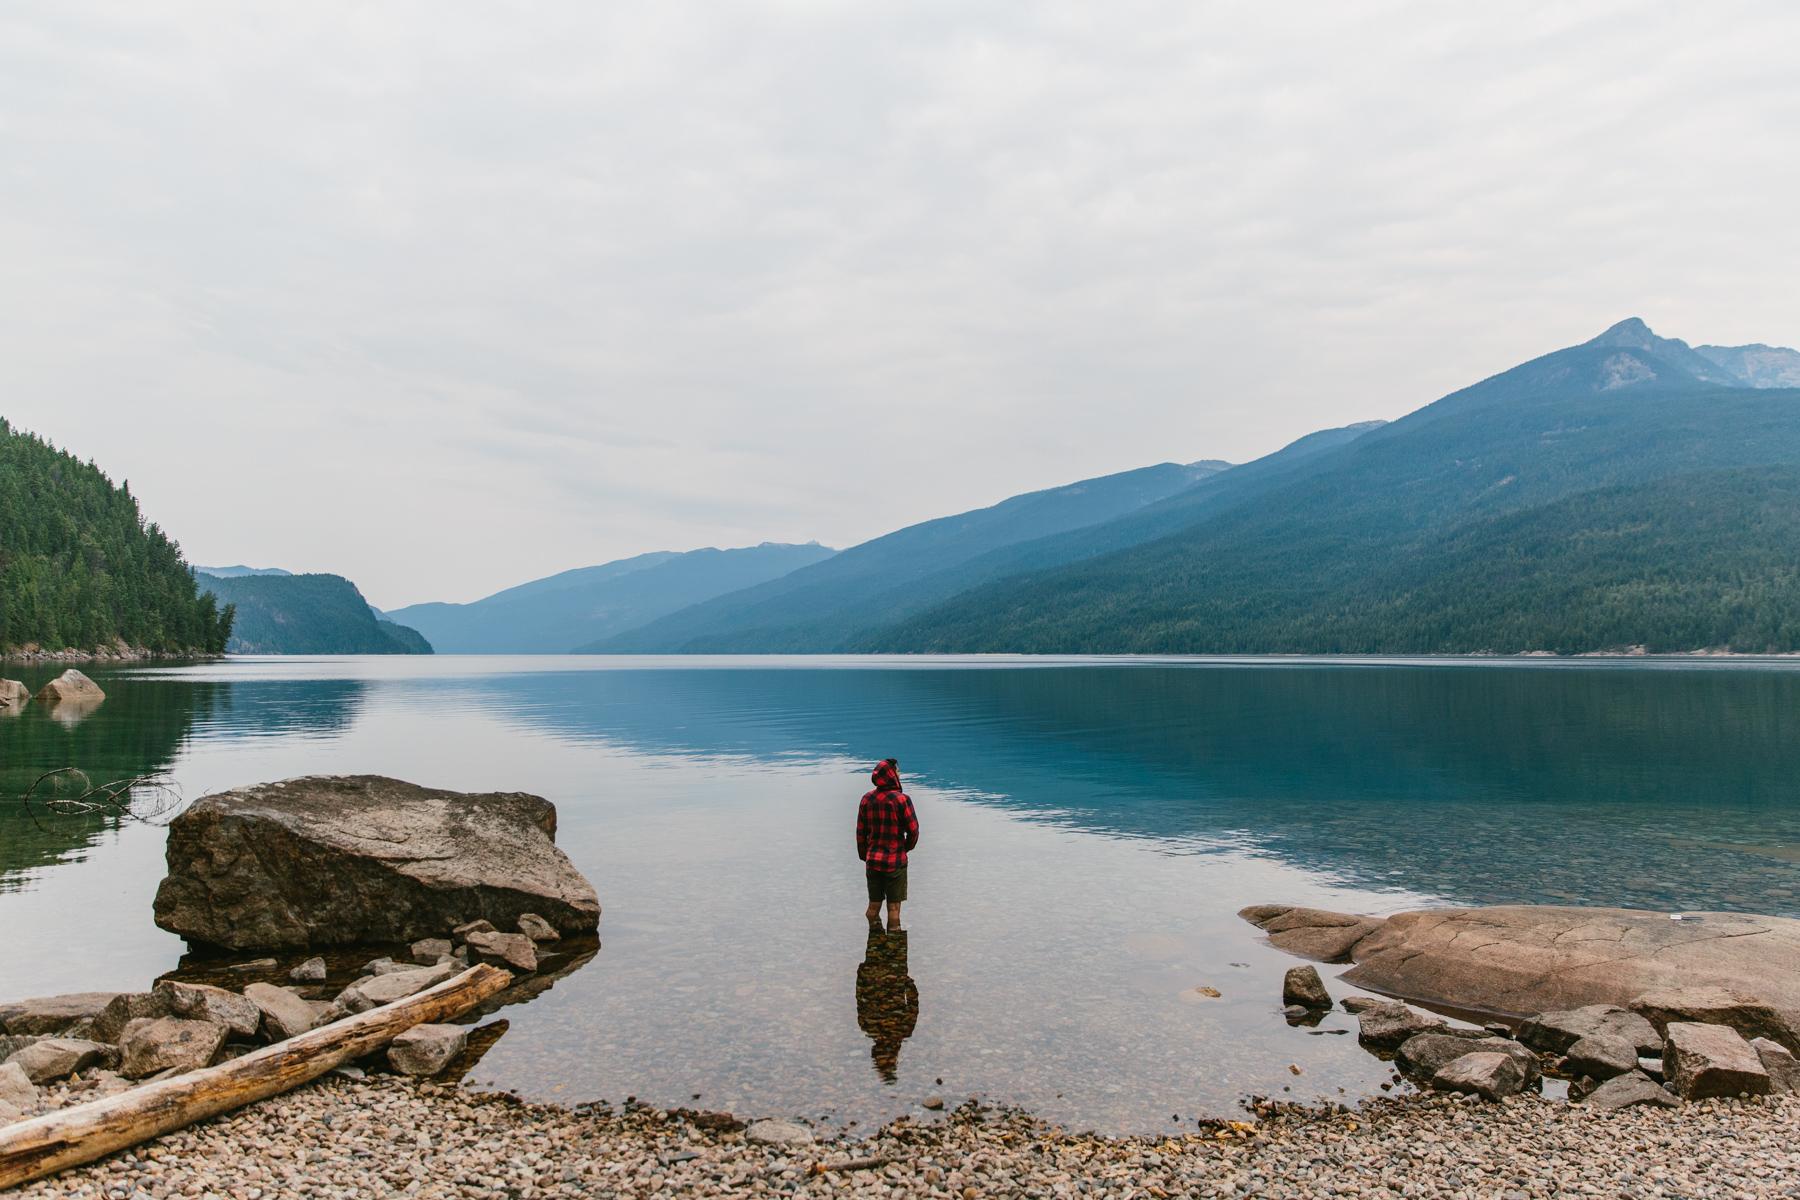 britishcolumbia-canada-lifestyle-photography-mikeseehagel-115